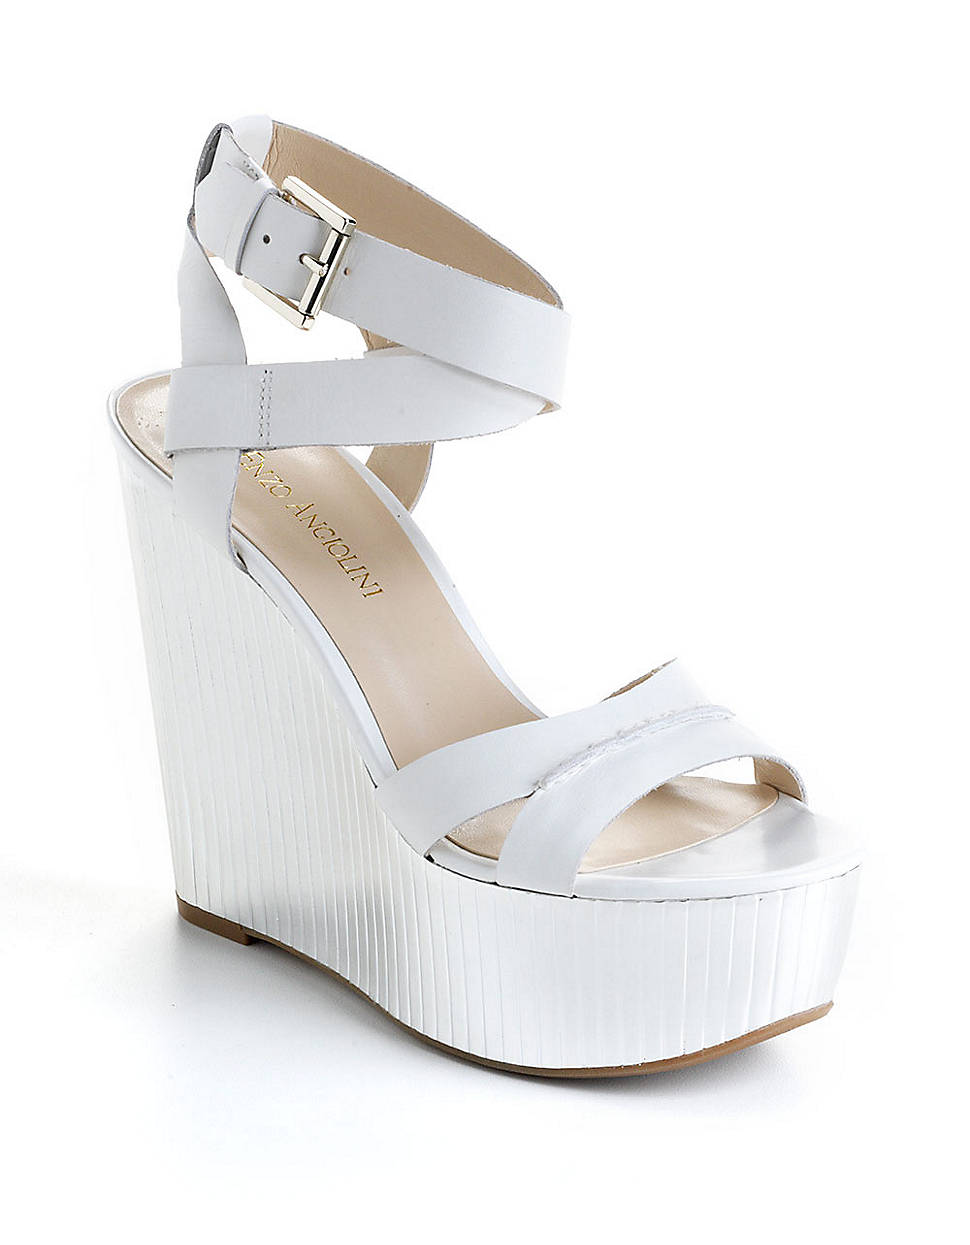 White Wedge Pump Shoes